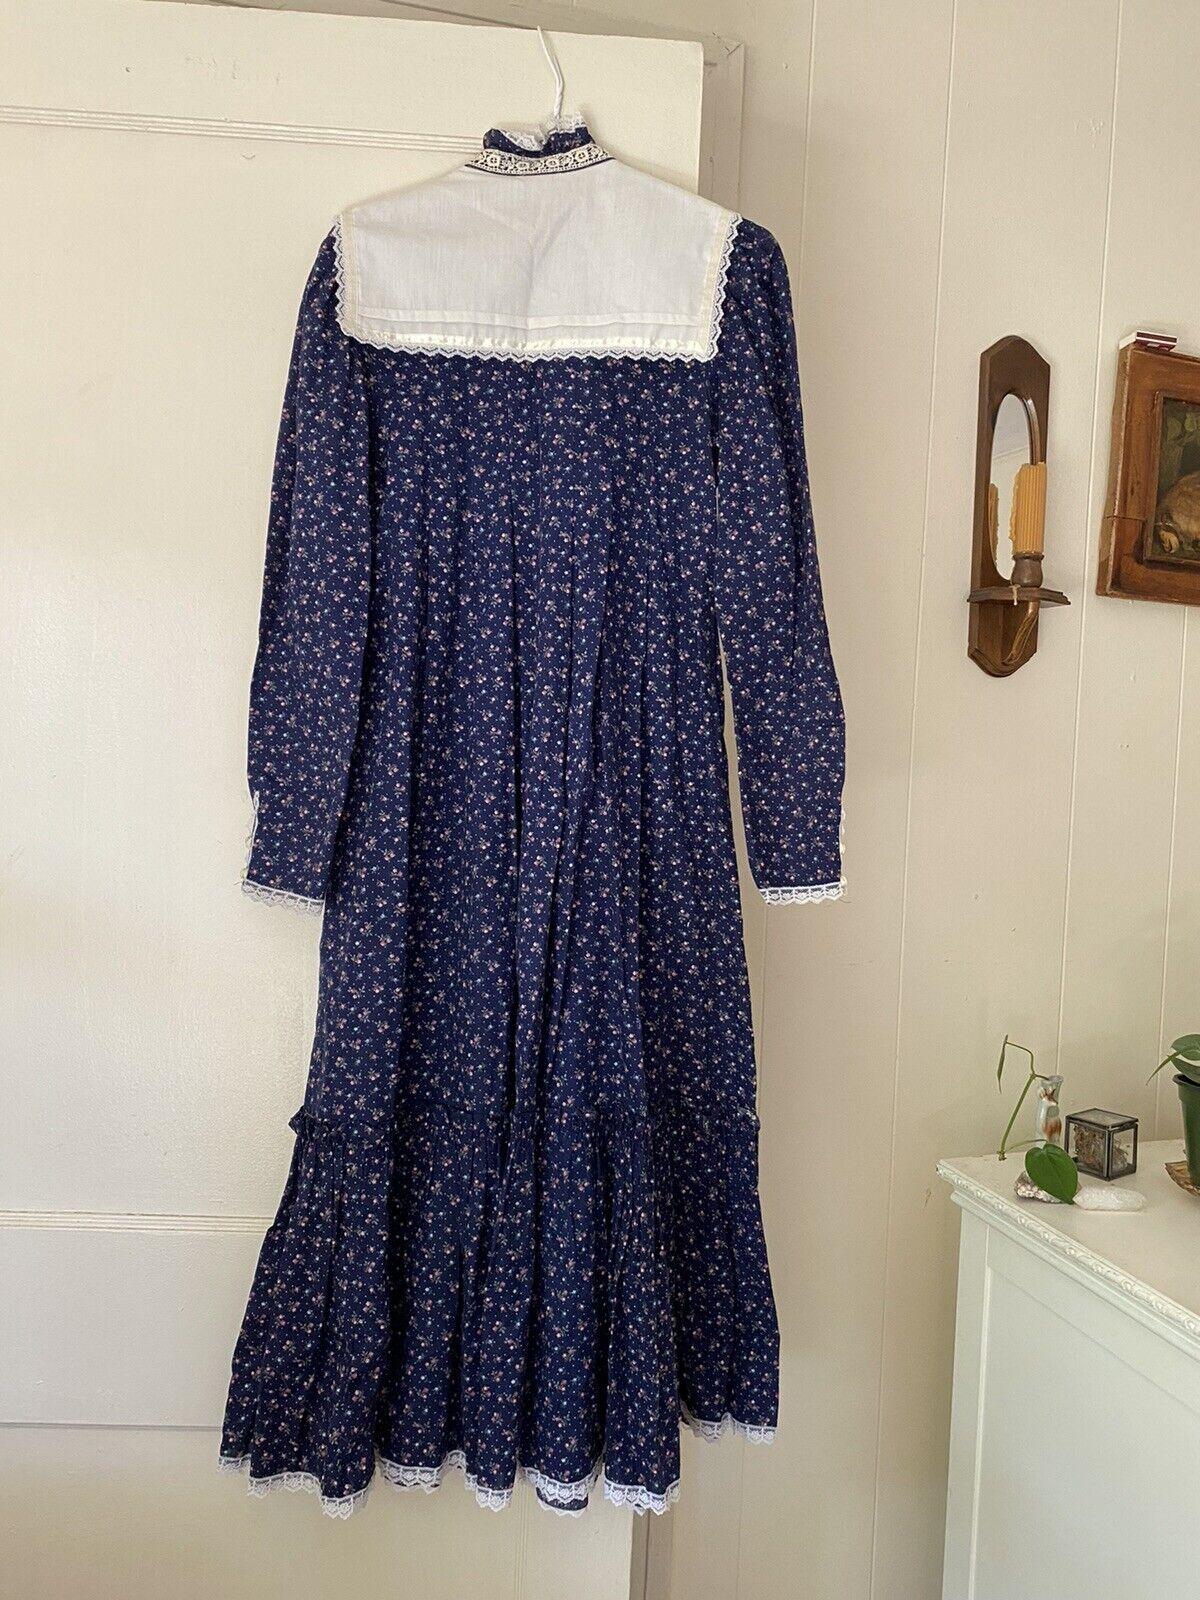 vintage gunne sax prairie dress (size 9) - image 2